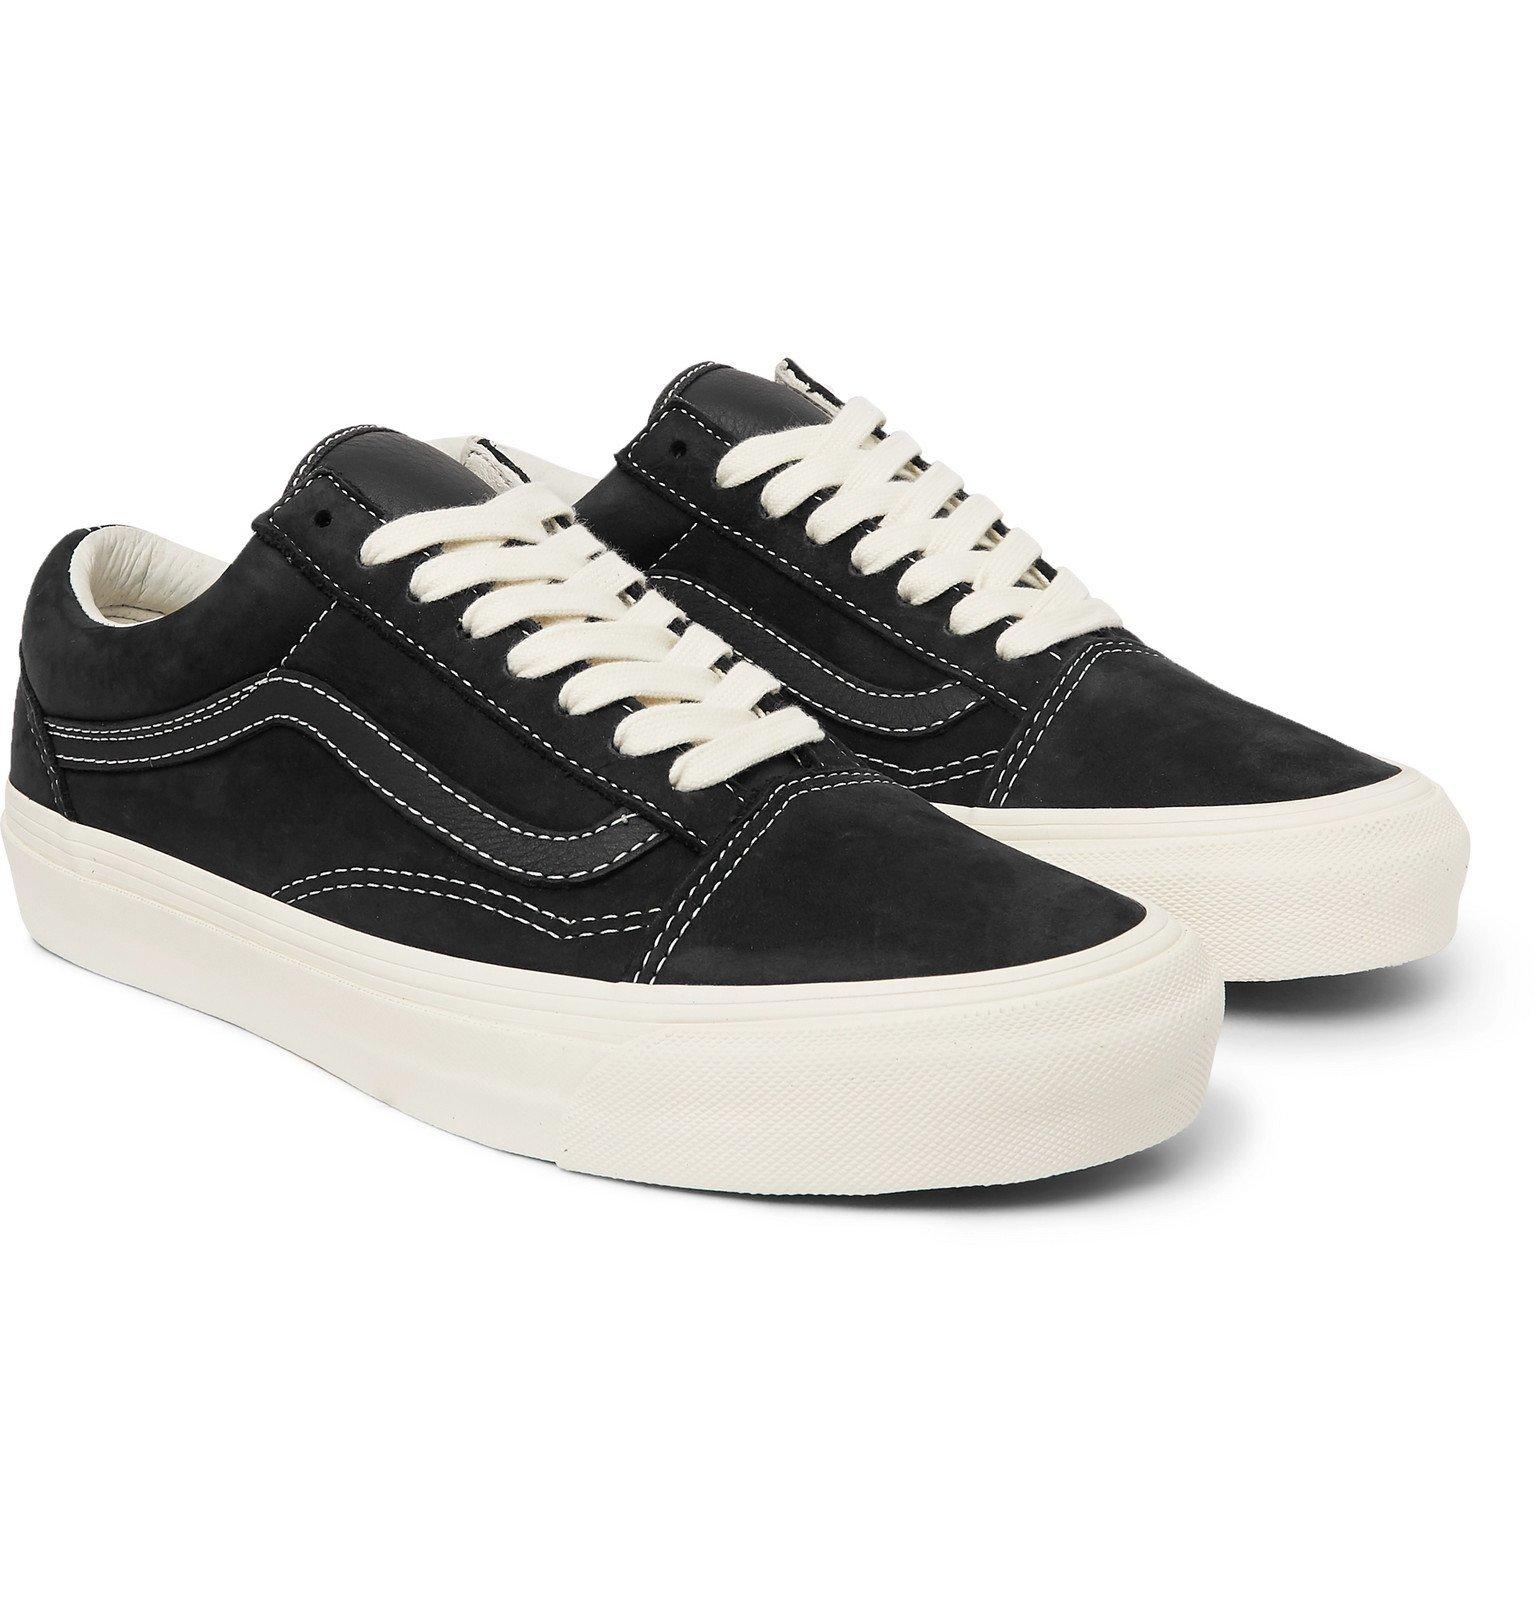 Photo: Vans - OG Old Skool LX Leather-Trimmed Nubuck Sneakers - Black